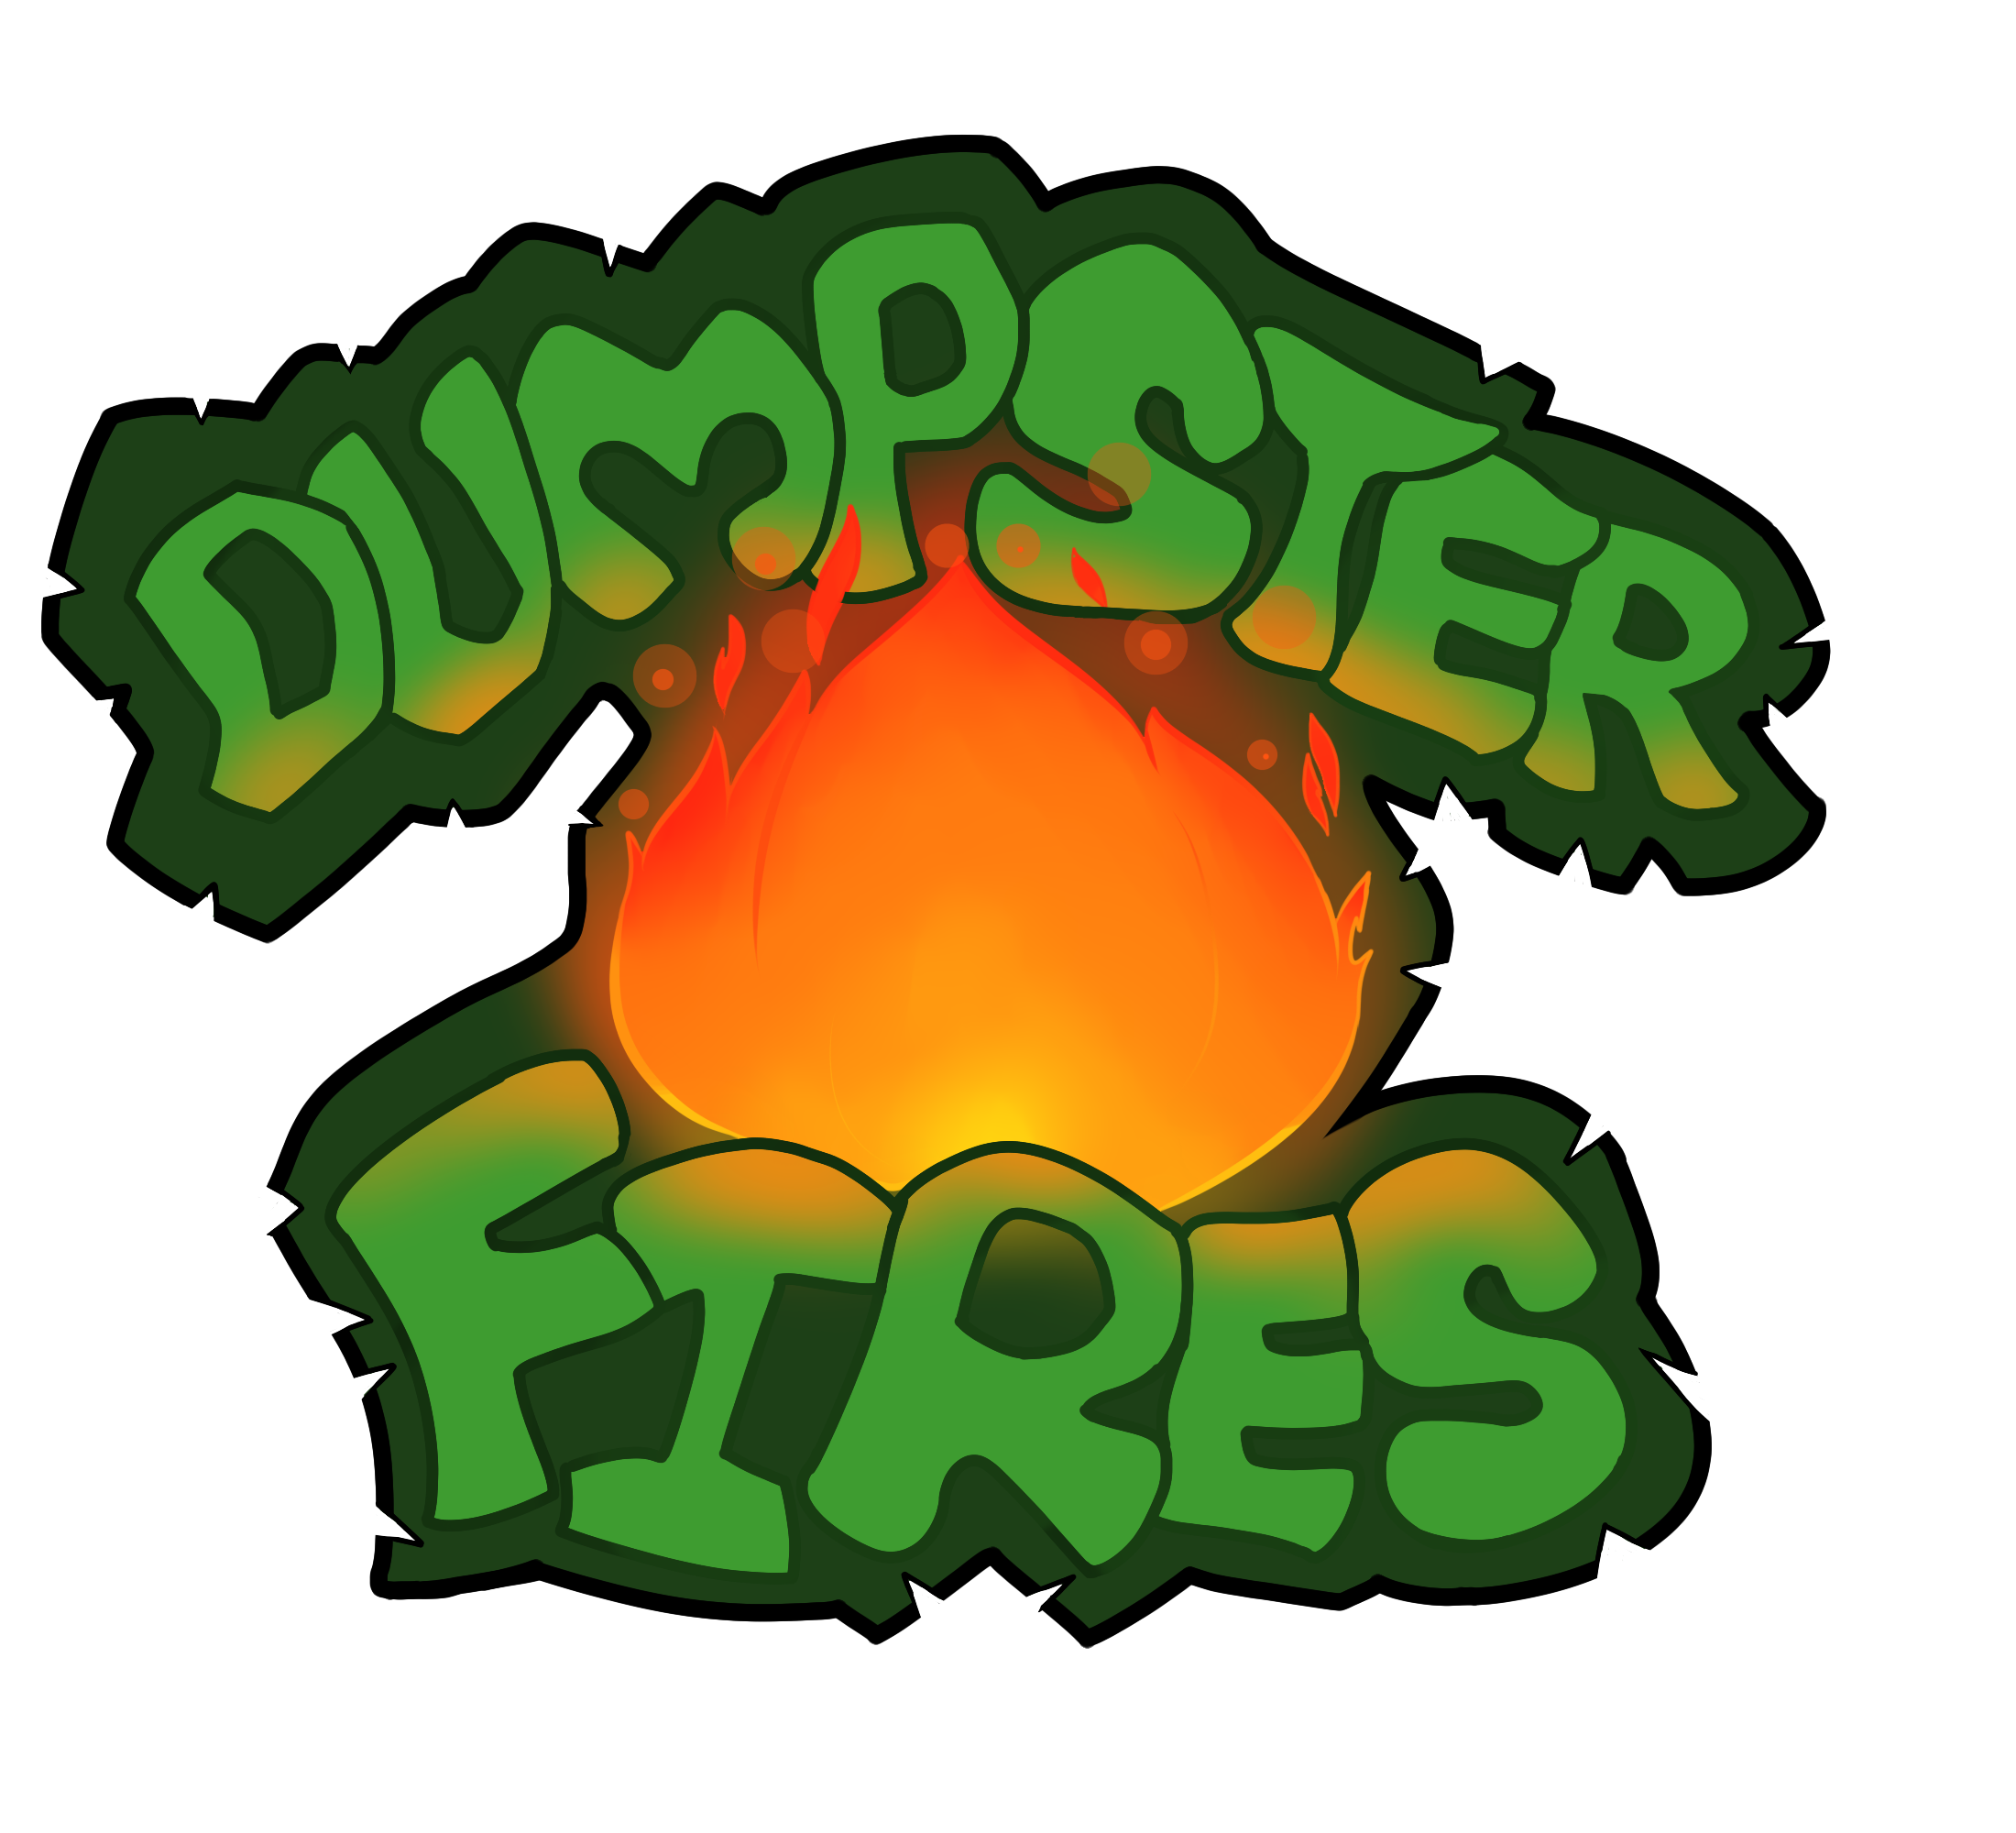 4626231_149417385751_dumpsterfires.png